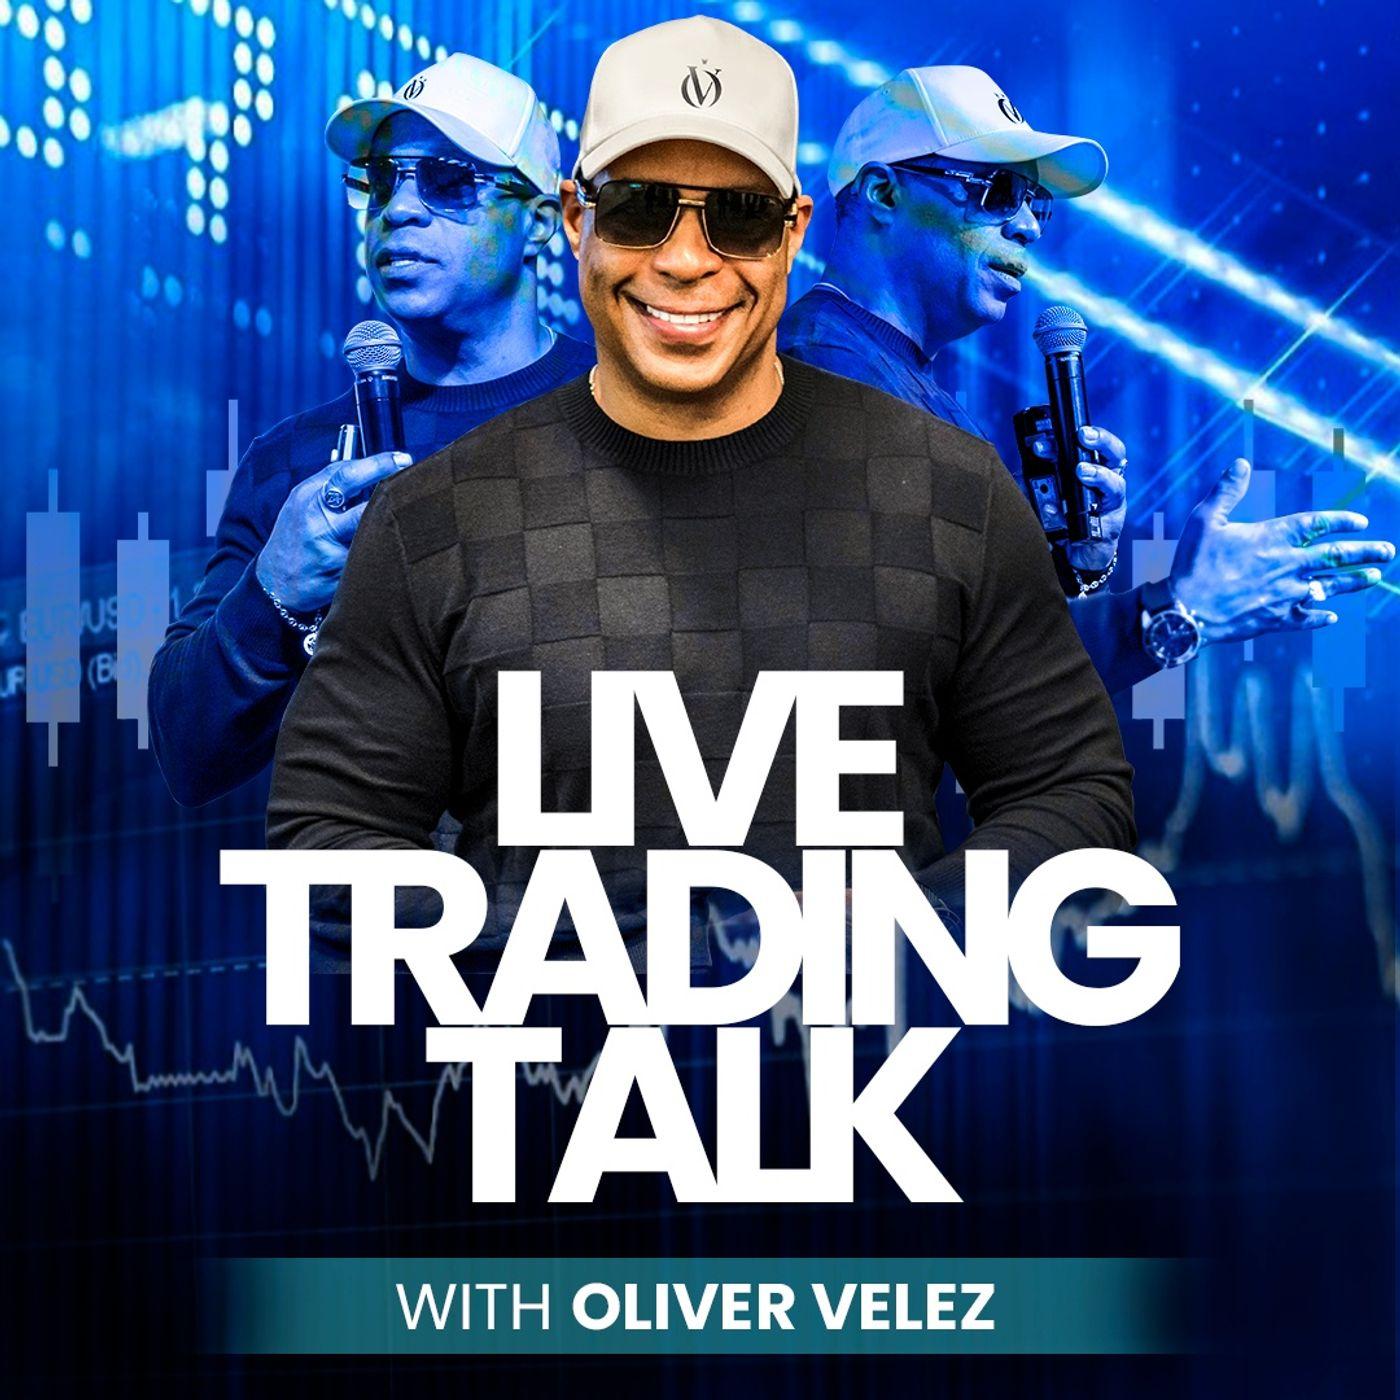 Live Trading Talk With Oliver Velez (English)